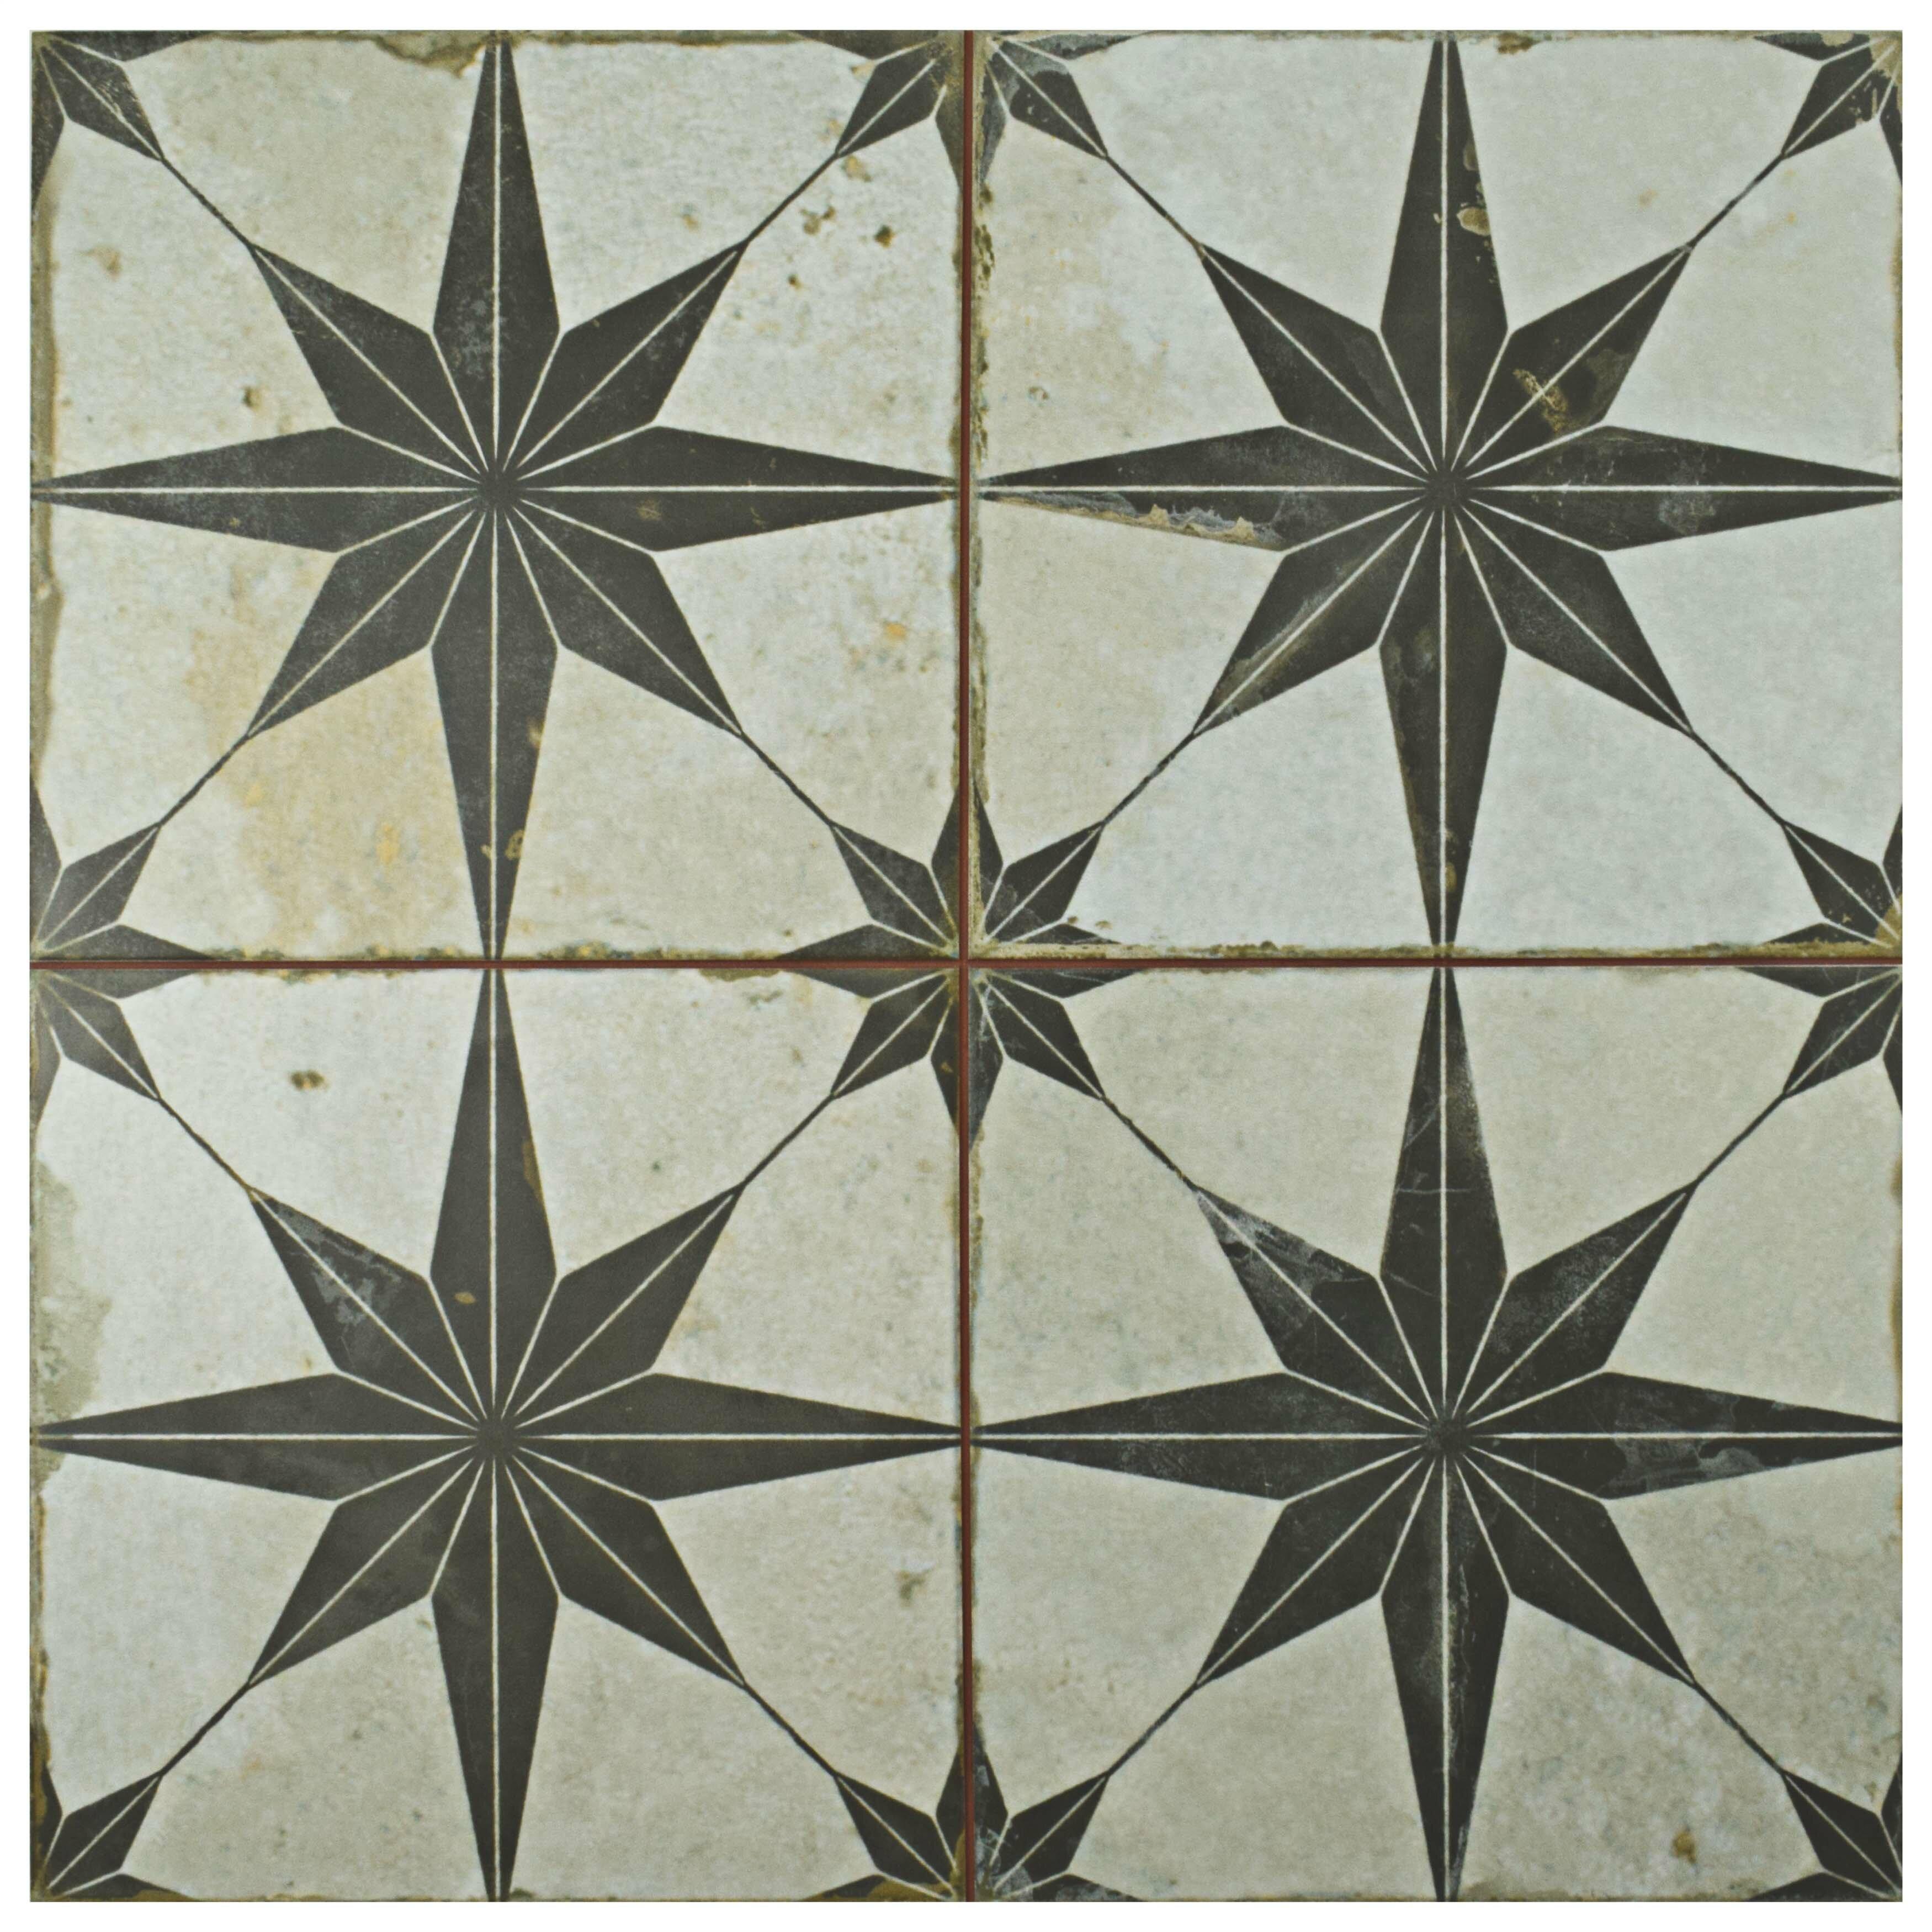 Elitetile royalty 1763 x 1763 ceramic field tile in beigegray elitetile royalty 1763 x 1763 ceramic field tile in beigegray reviews wayfair dailygadgetfo Choice Image